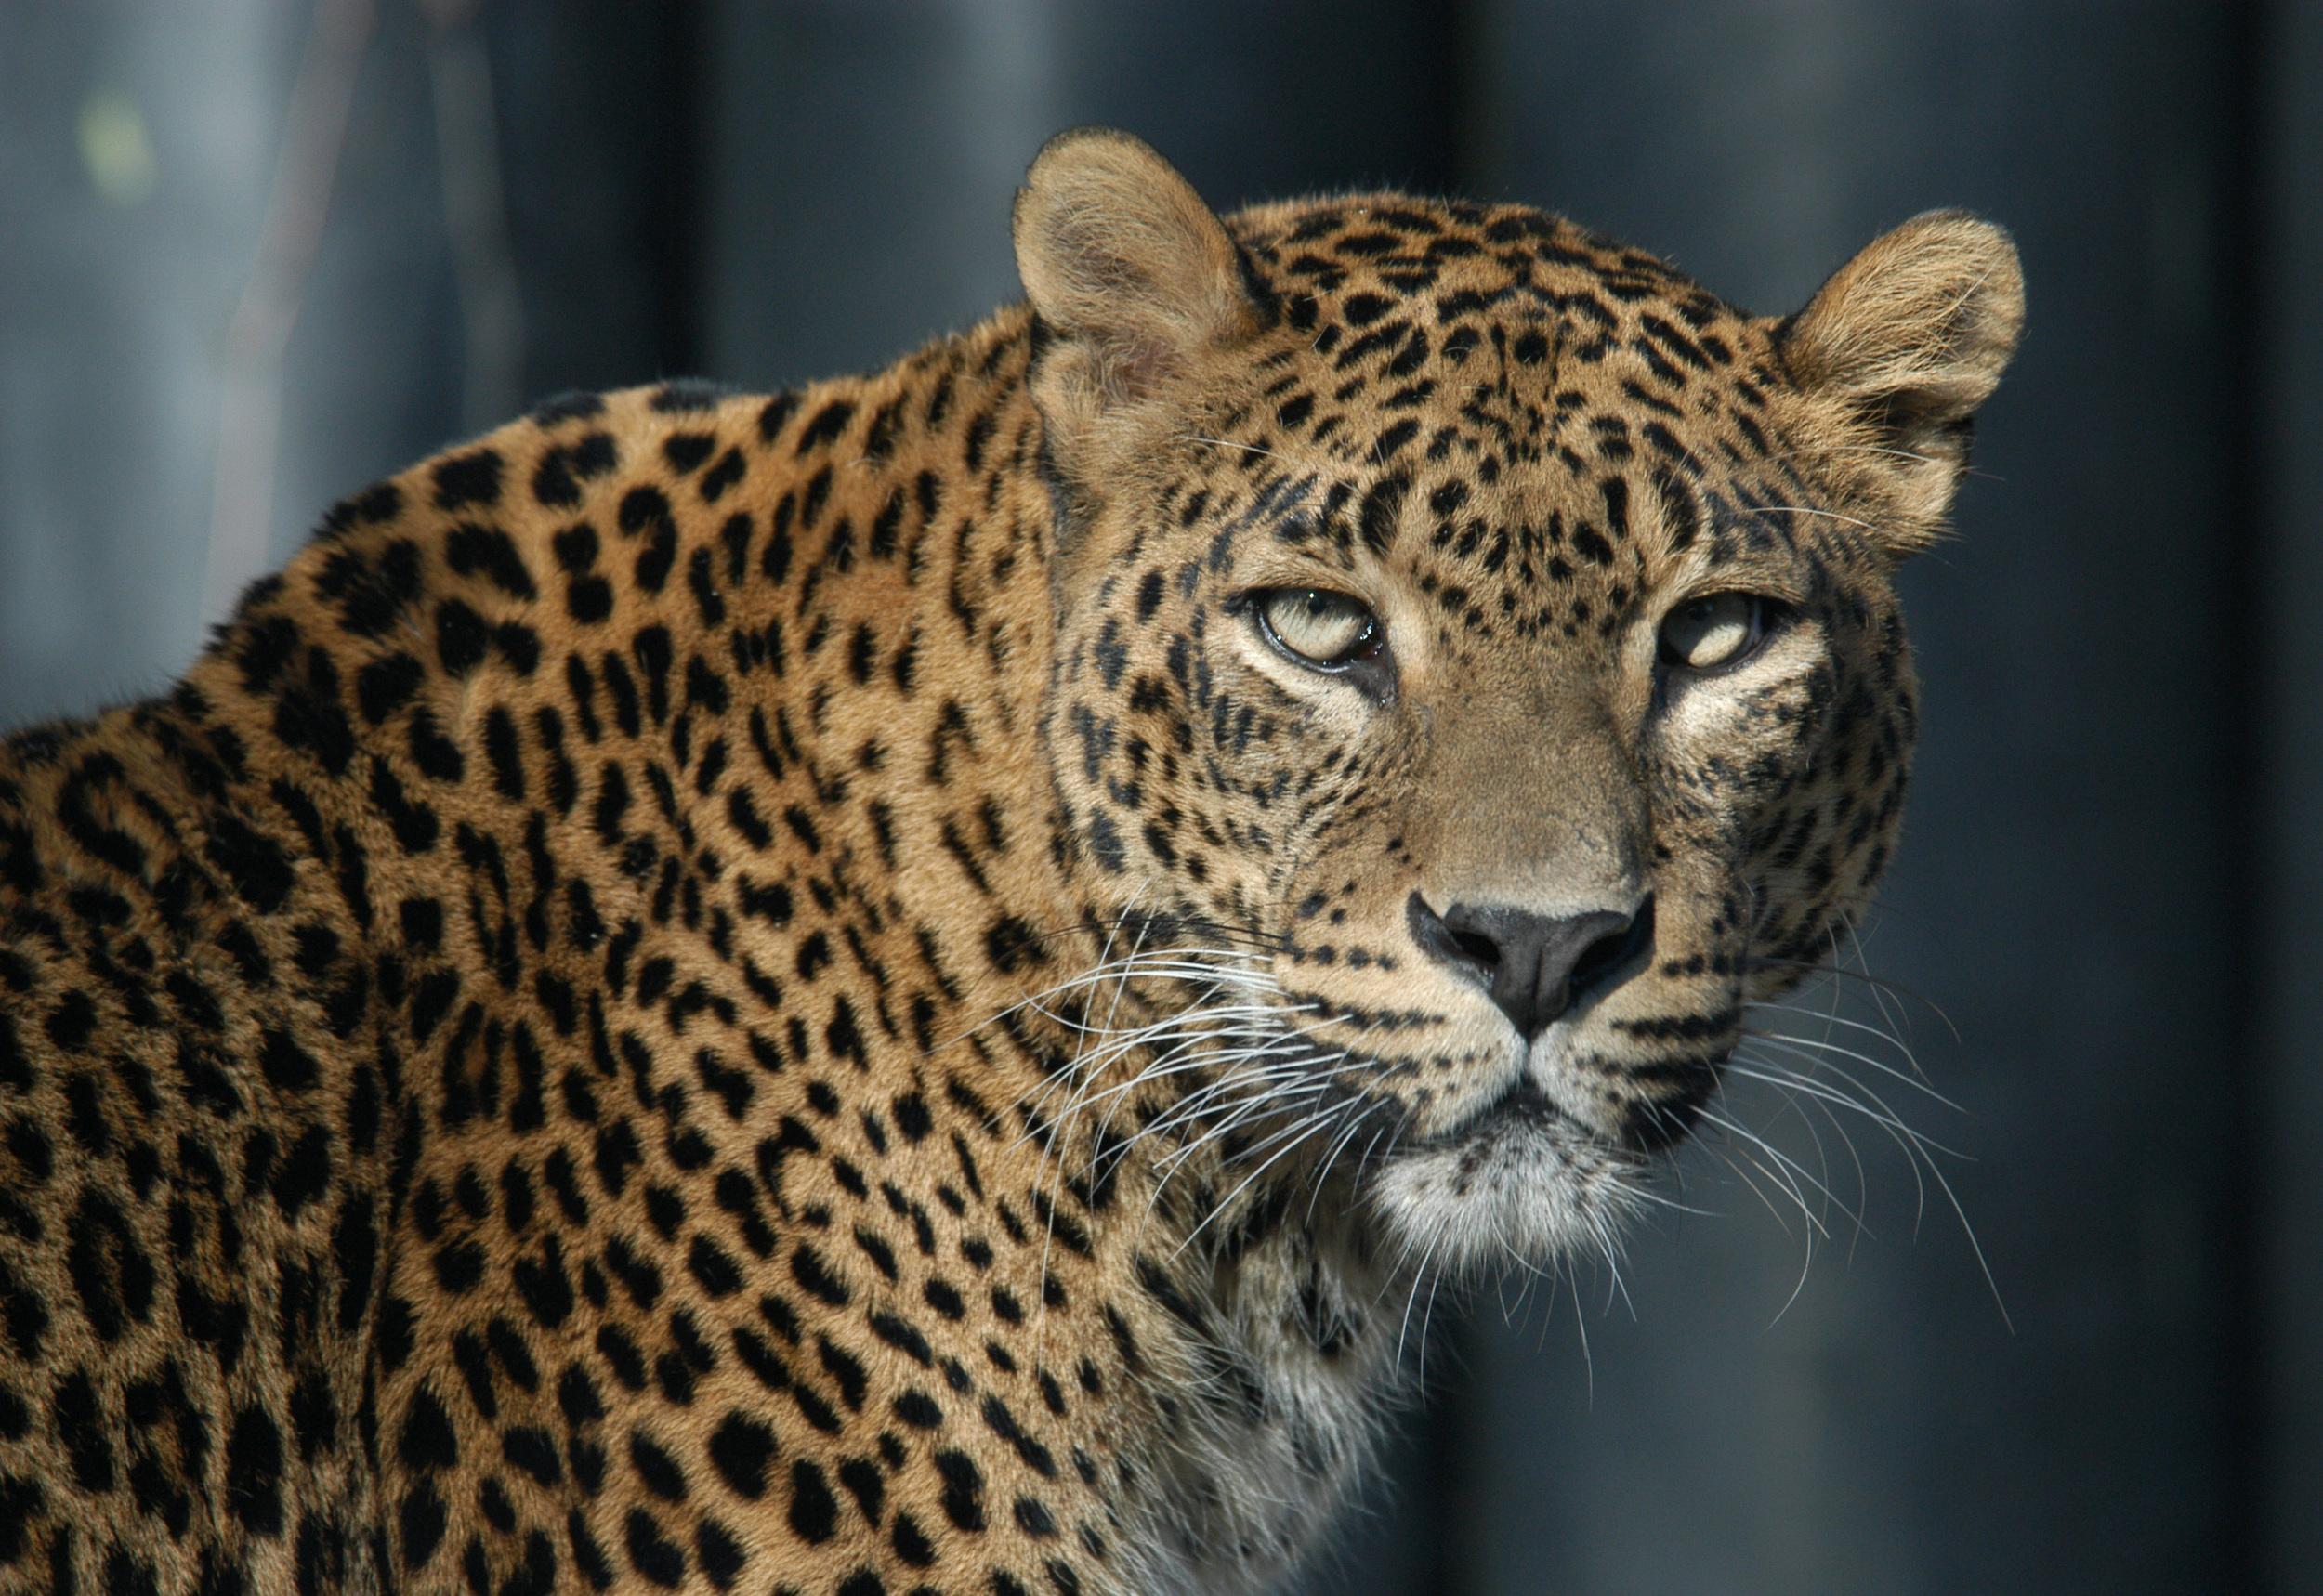 invite-to-paradise-sri-lanka-honeymoon-holiday-wildlife-leopard-safari-2.jpg